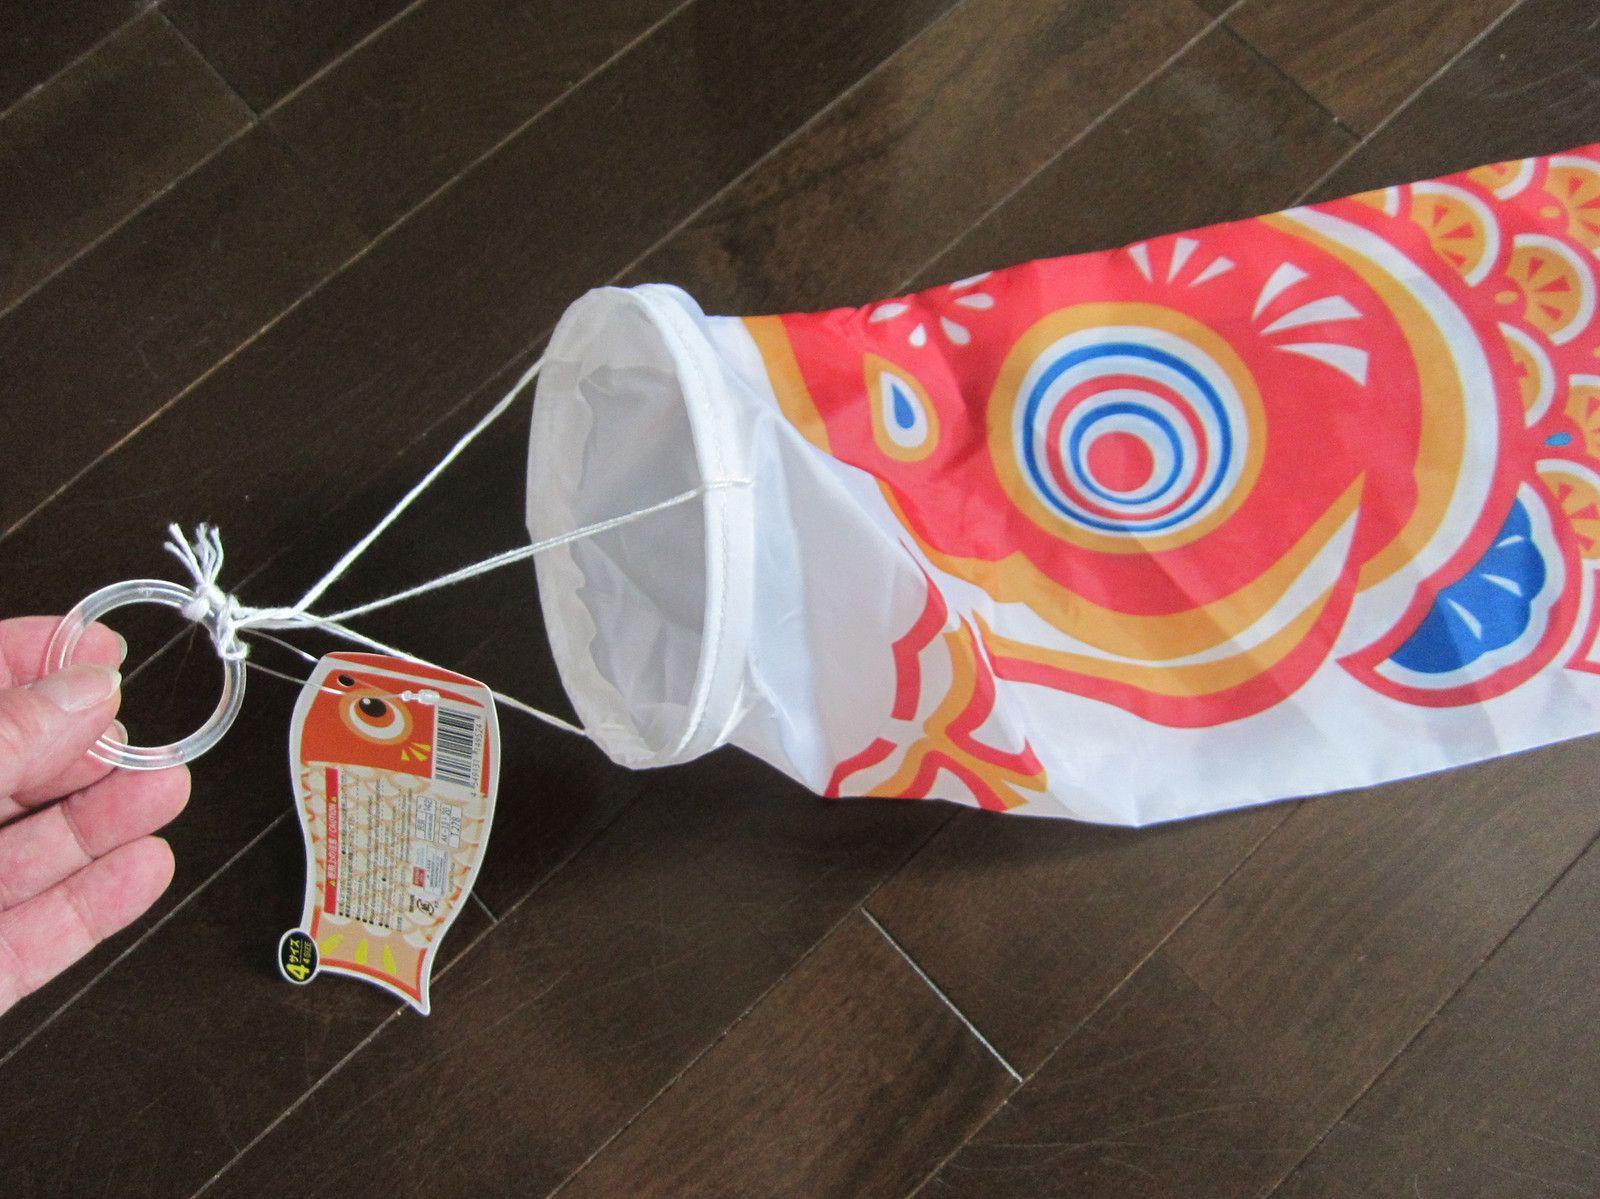 Big japanese koi carp fish windsock kite nylon with wire for Japanese koi windsock